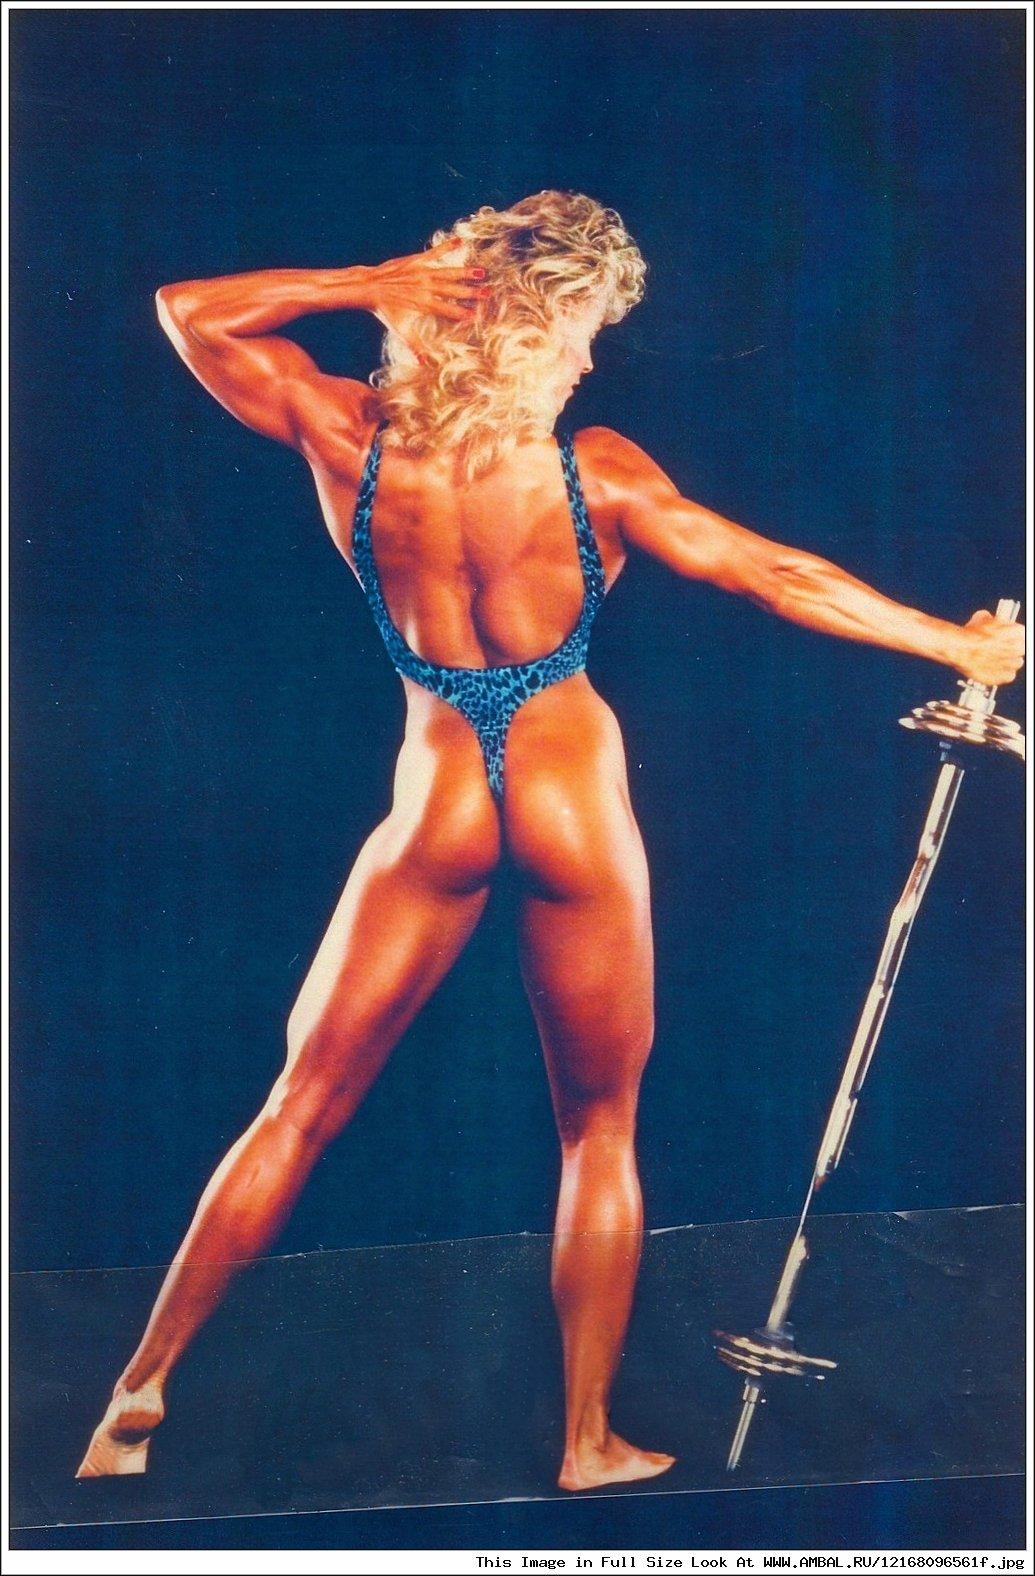 Tonya knight nude pics nsfw films